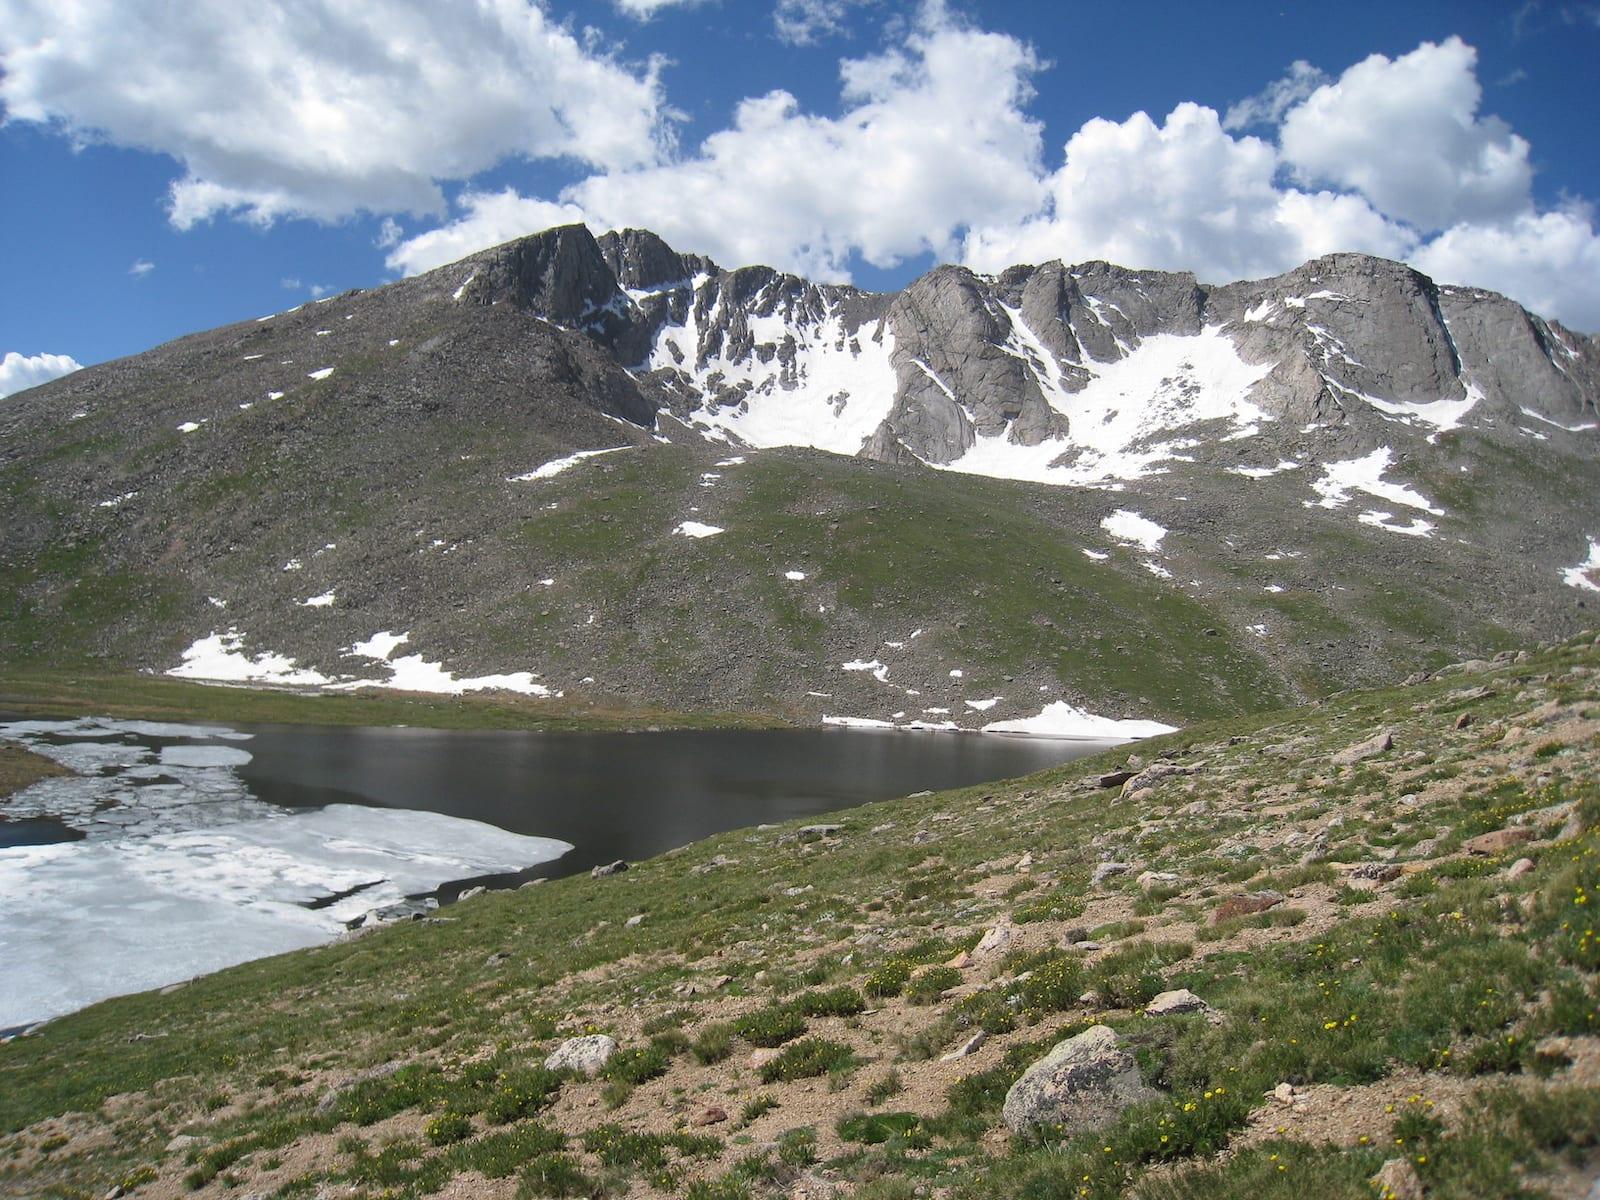 Mount Evans Wilderness, CO